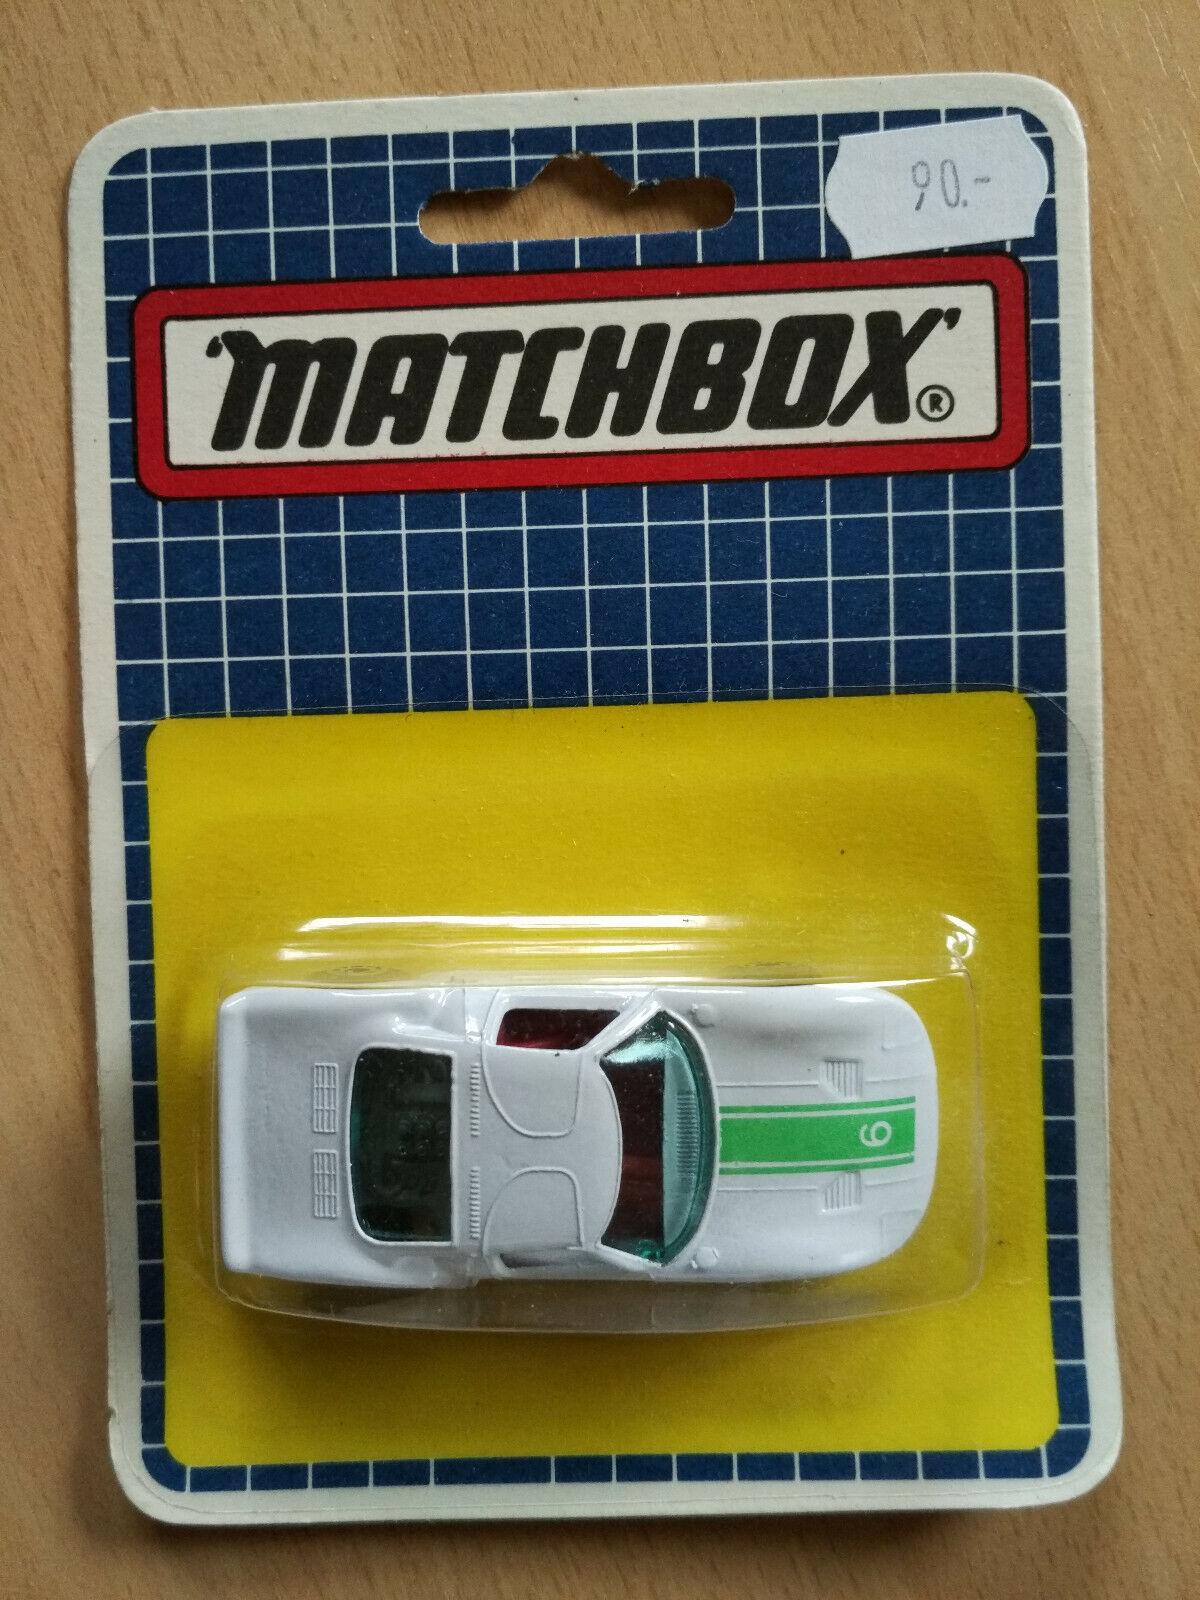 venderse como panqueques Matchbox súperfast Hungría Ford Gt Gt Gt En Blister, variación de Rareza  online al mejor precio